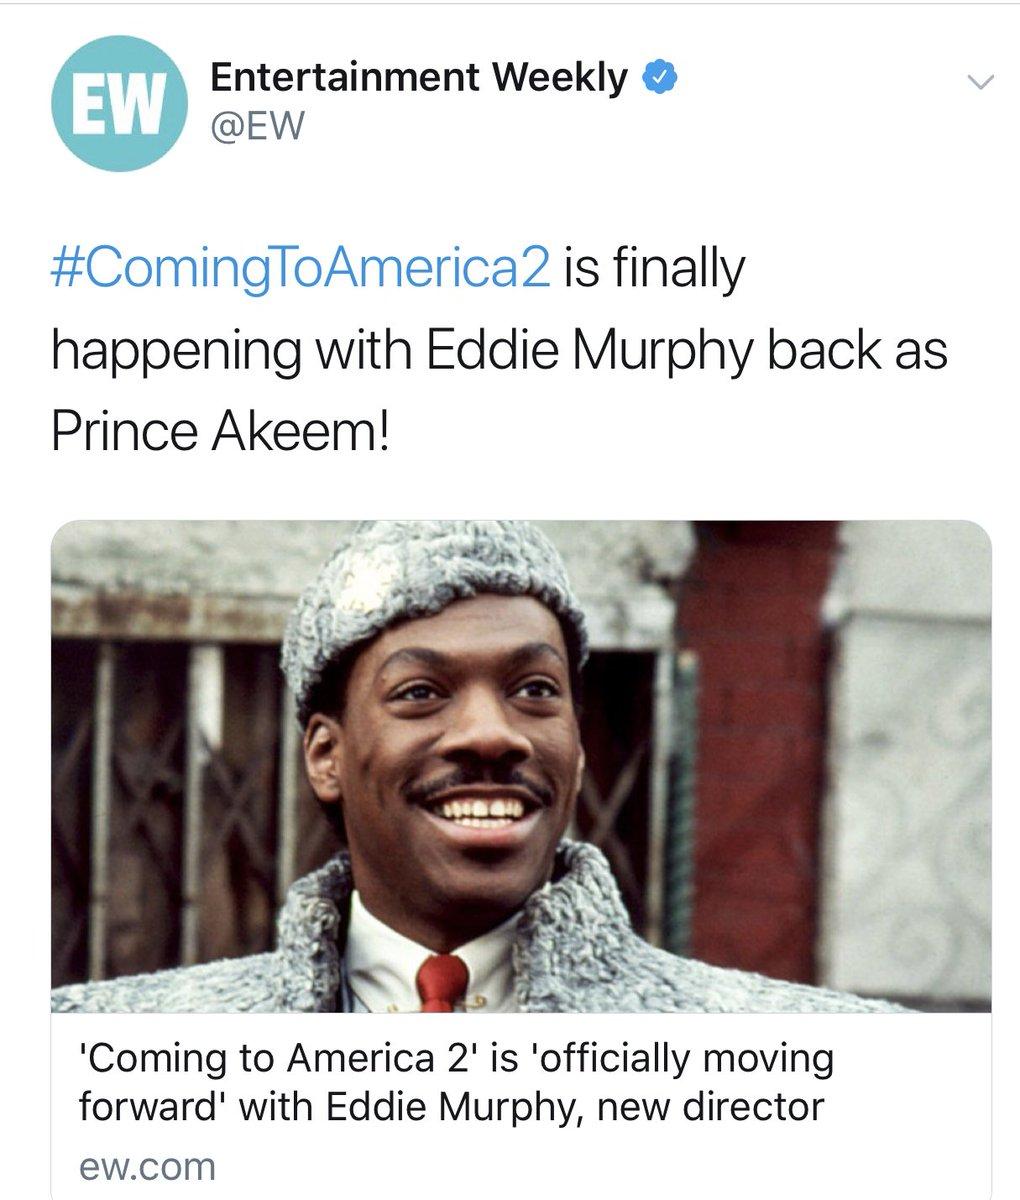 Yaaasssss!!!💃🏽 #BestNewsEver!!👏🏾 #ComingToAmerica2🎟🎬🍿 #Sequel🎥🎞 #EddieMurphy @arseniohall @JamesEarlJones...